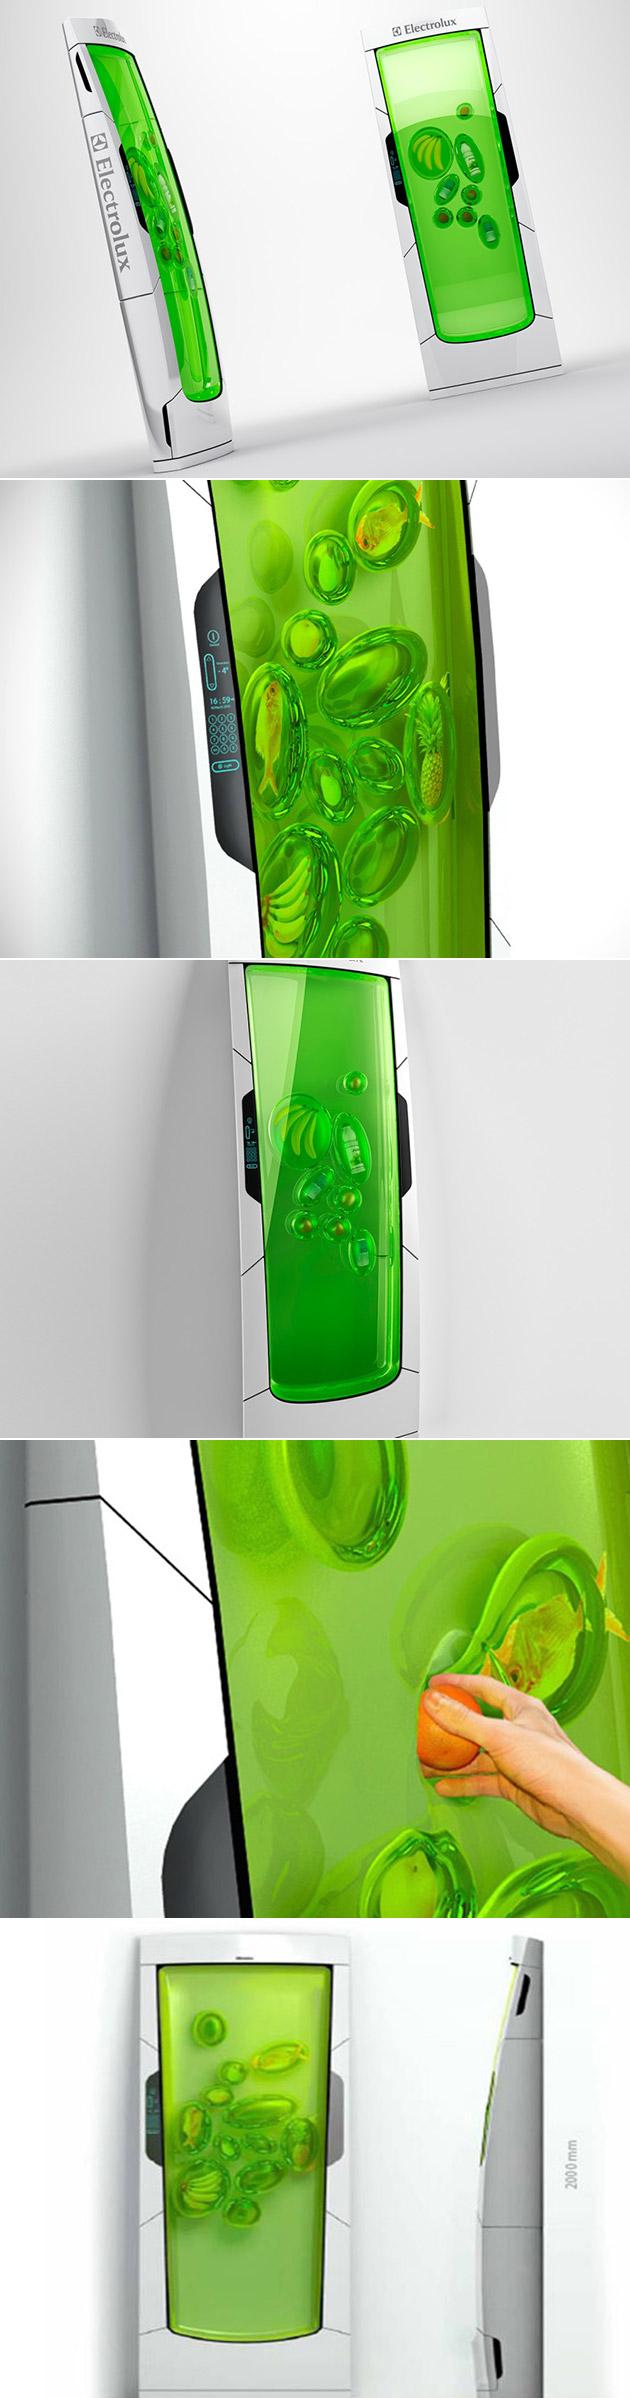 Zero energy bio robot refrigerator doesn 39 t require for Bio robot fridge cost